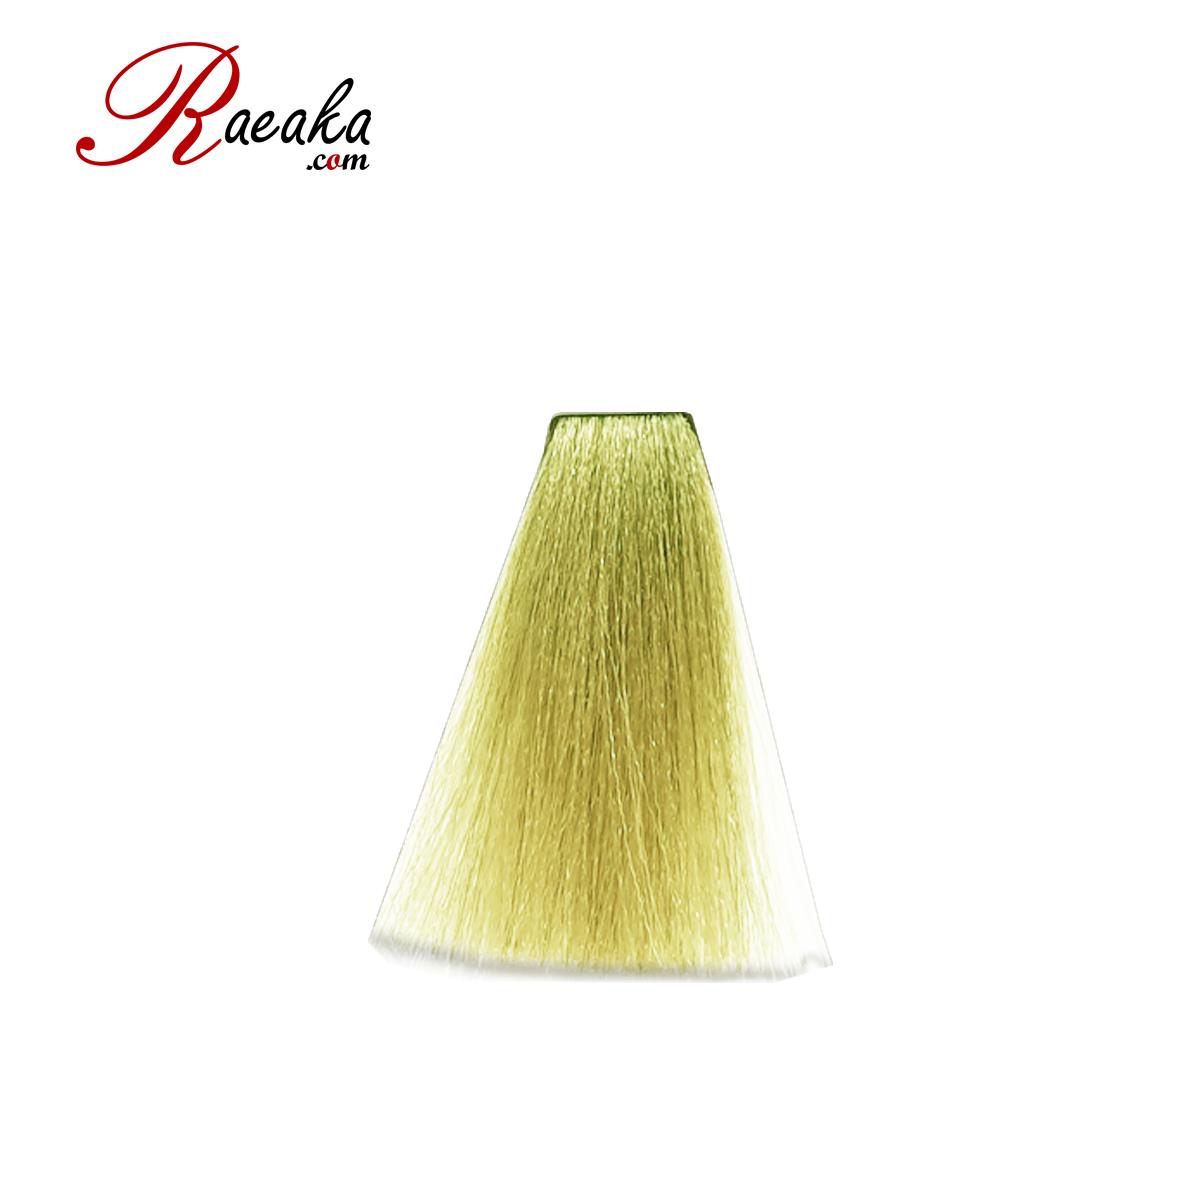 رنگ مو دوماسی سری زیتونی بلوند زیتونی خیلی خیلی روشن ۱۲٫۸ حجم ۱۲۰ میلی لیتر